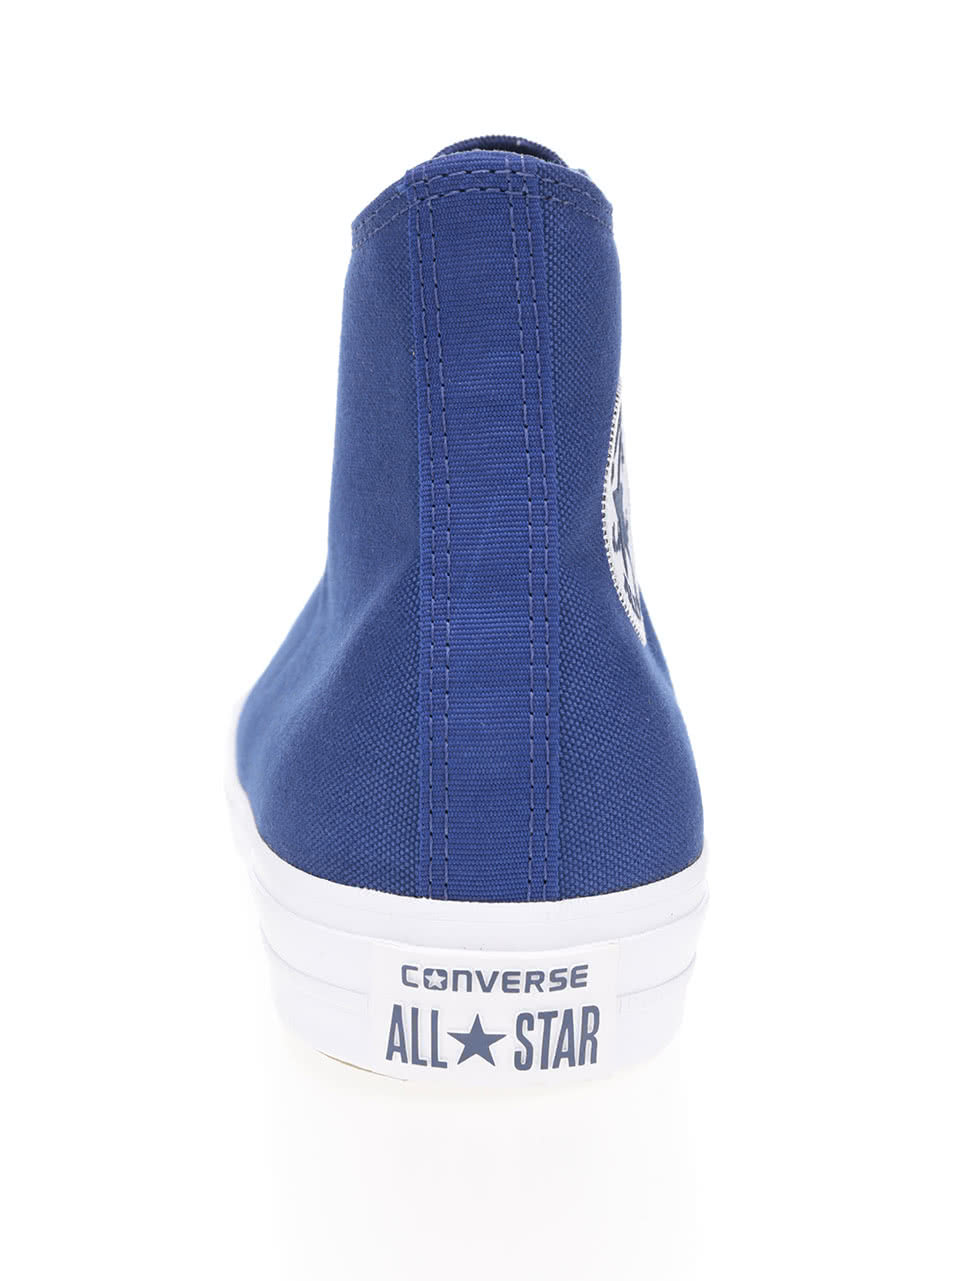 Modré unisex kotníkové tenisky s bílým logem Converse Chuck Taylor All Star  ... e433008130b